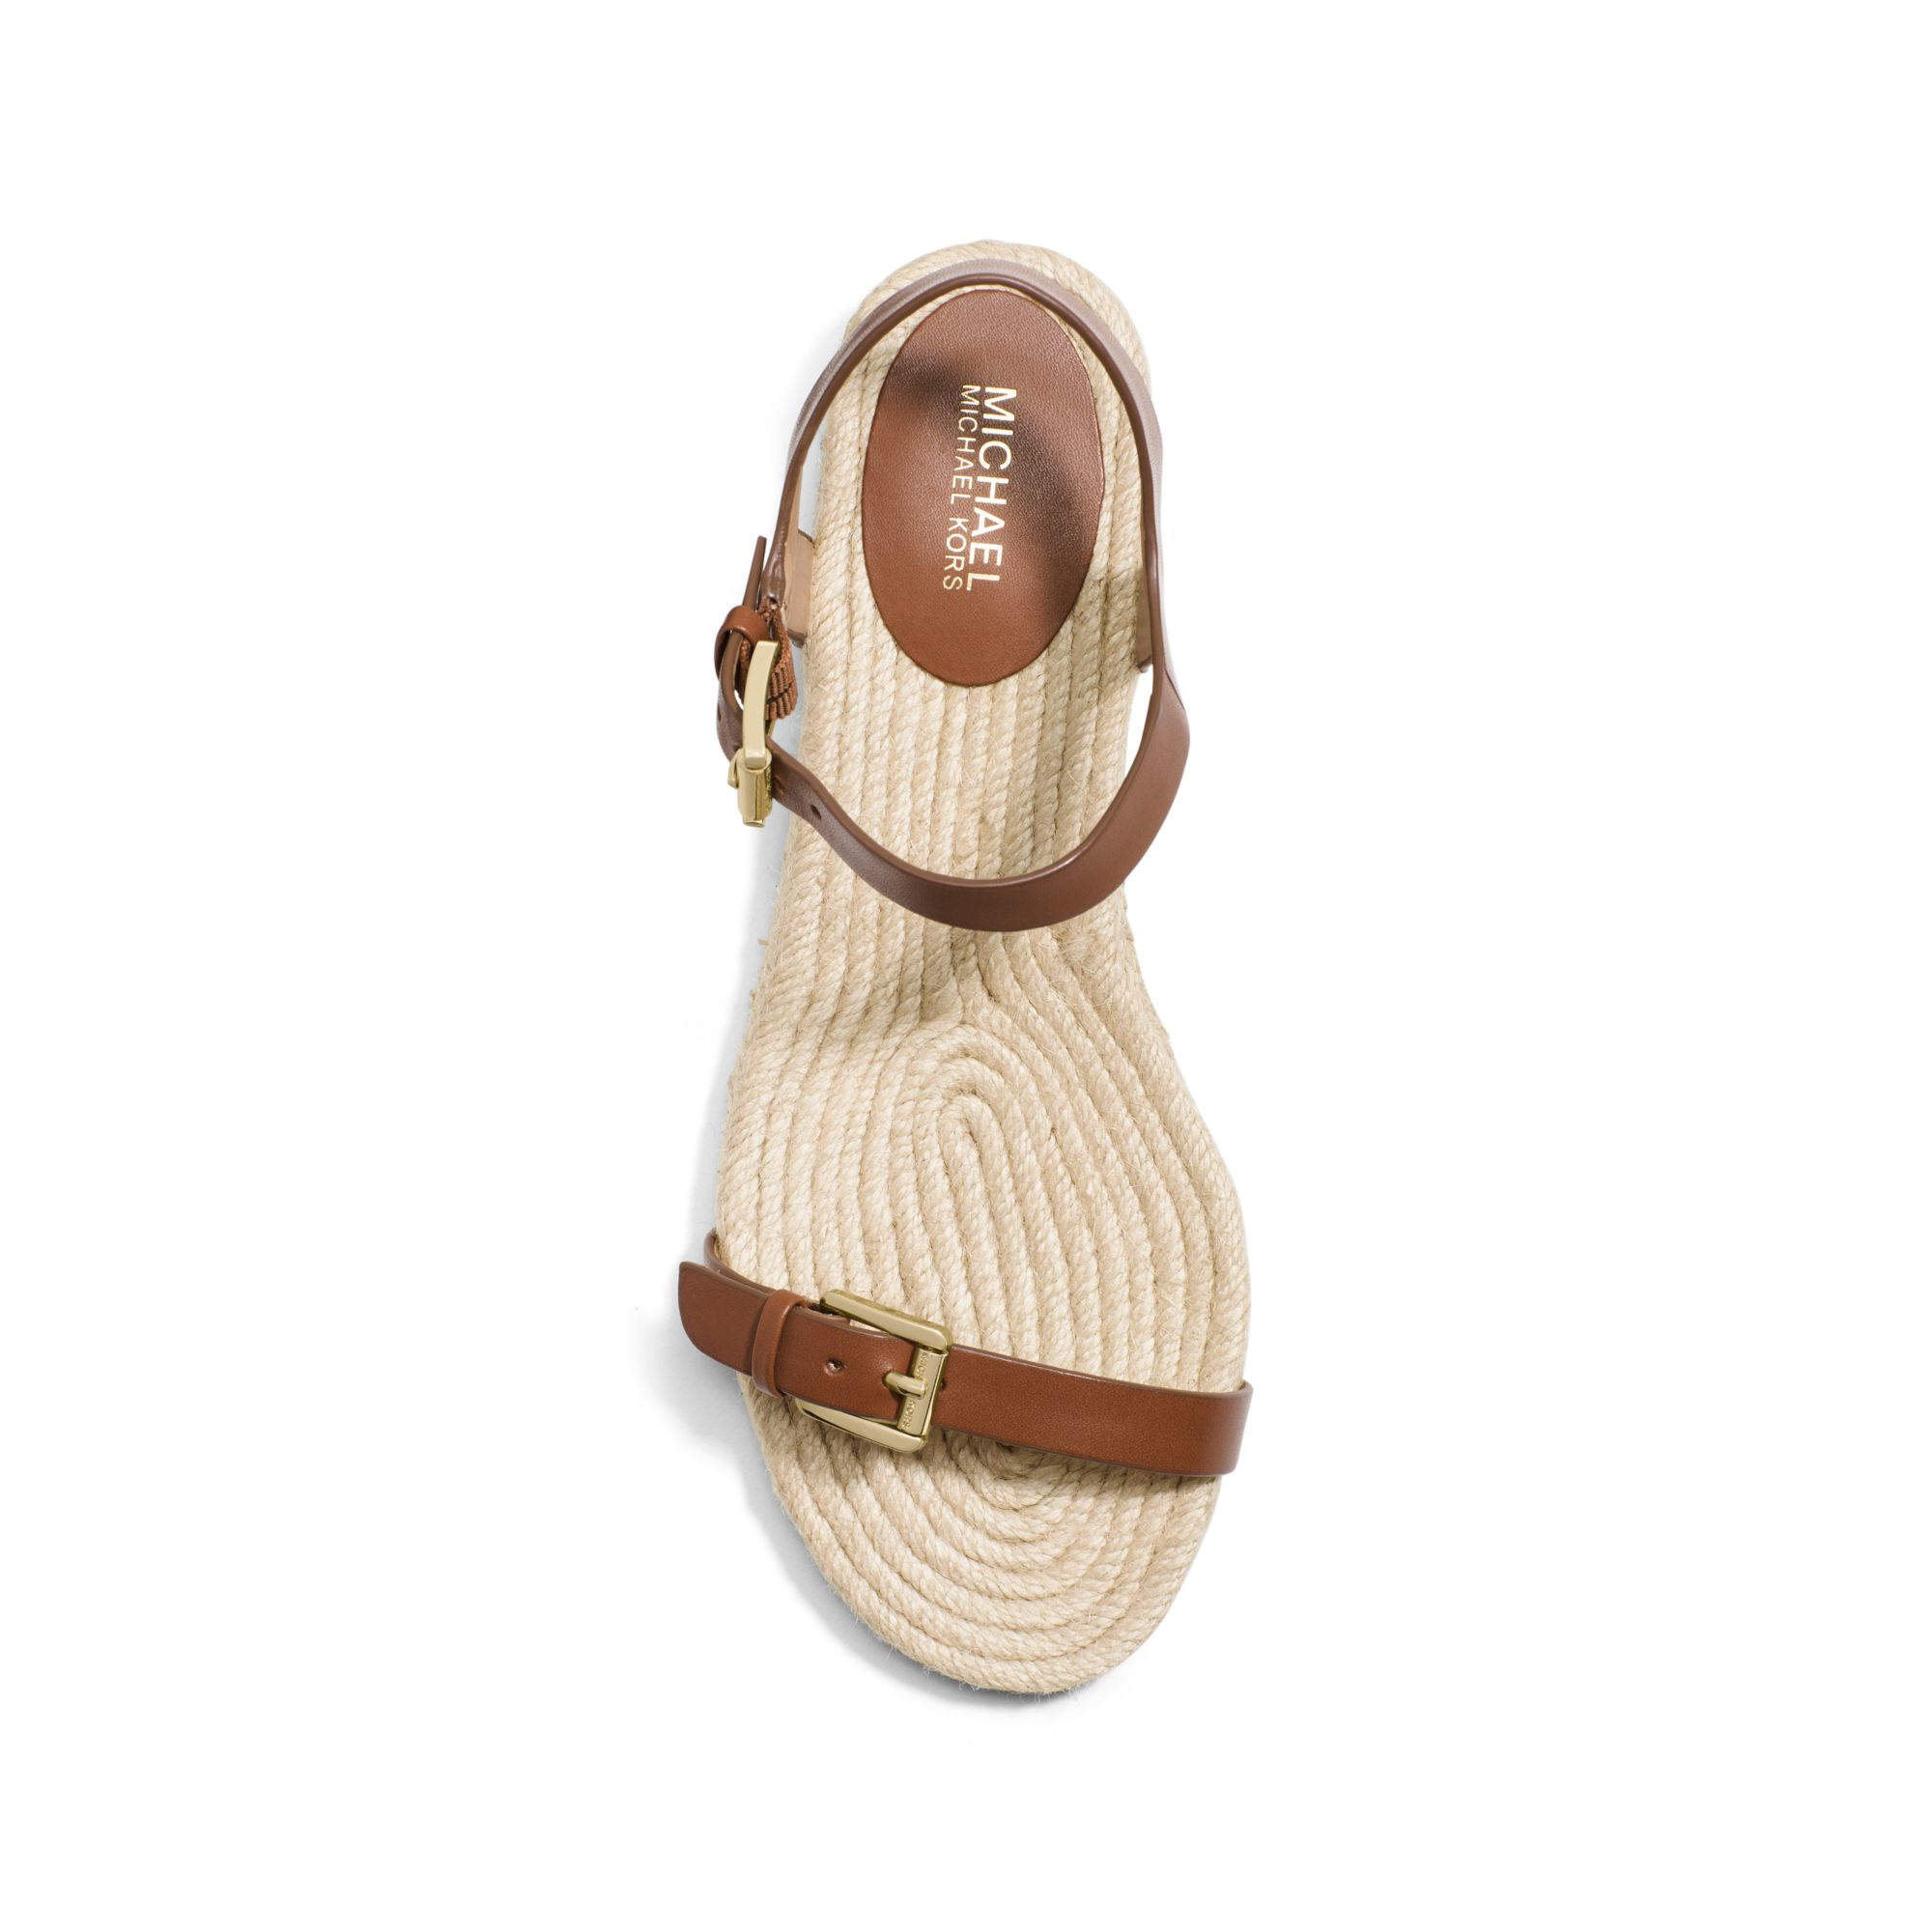 Lyst Michael Kors Kyla Leather Sandal